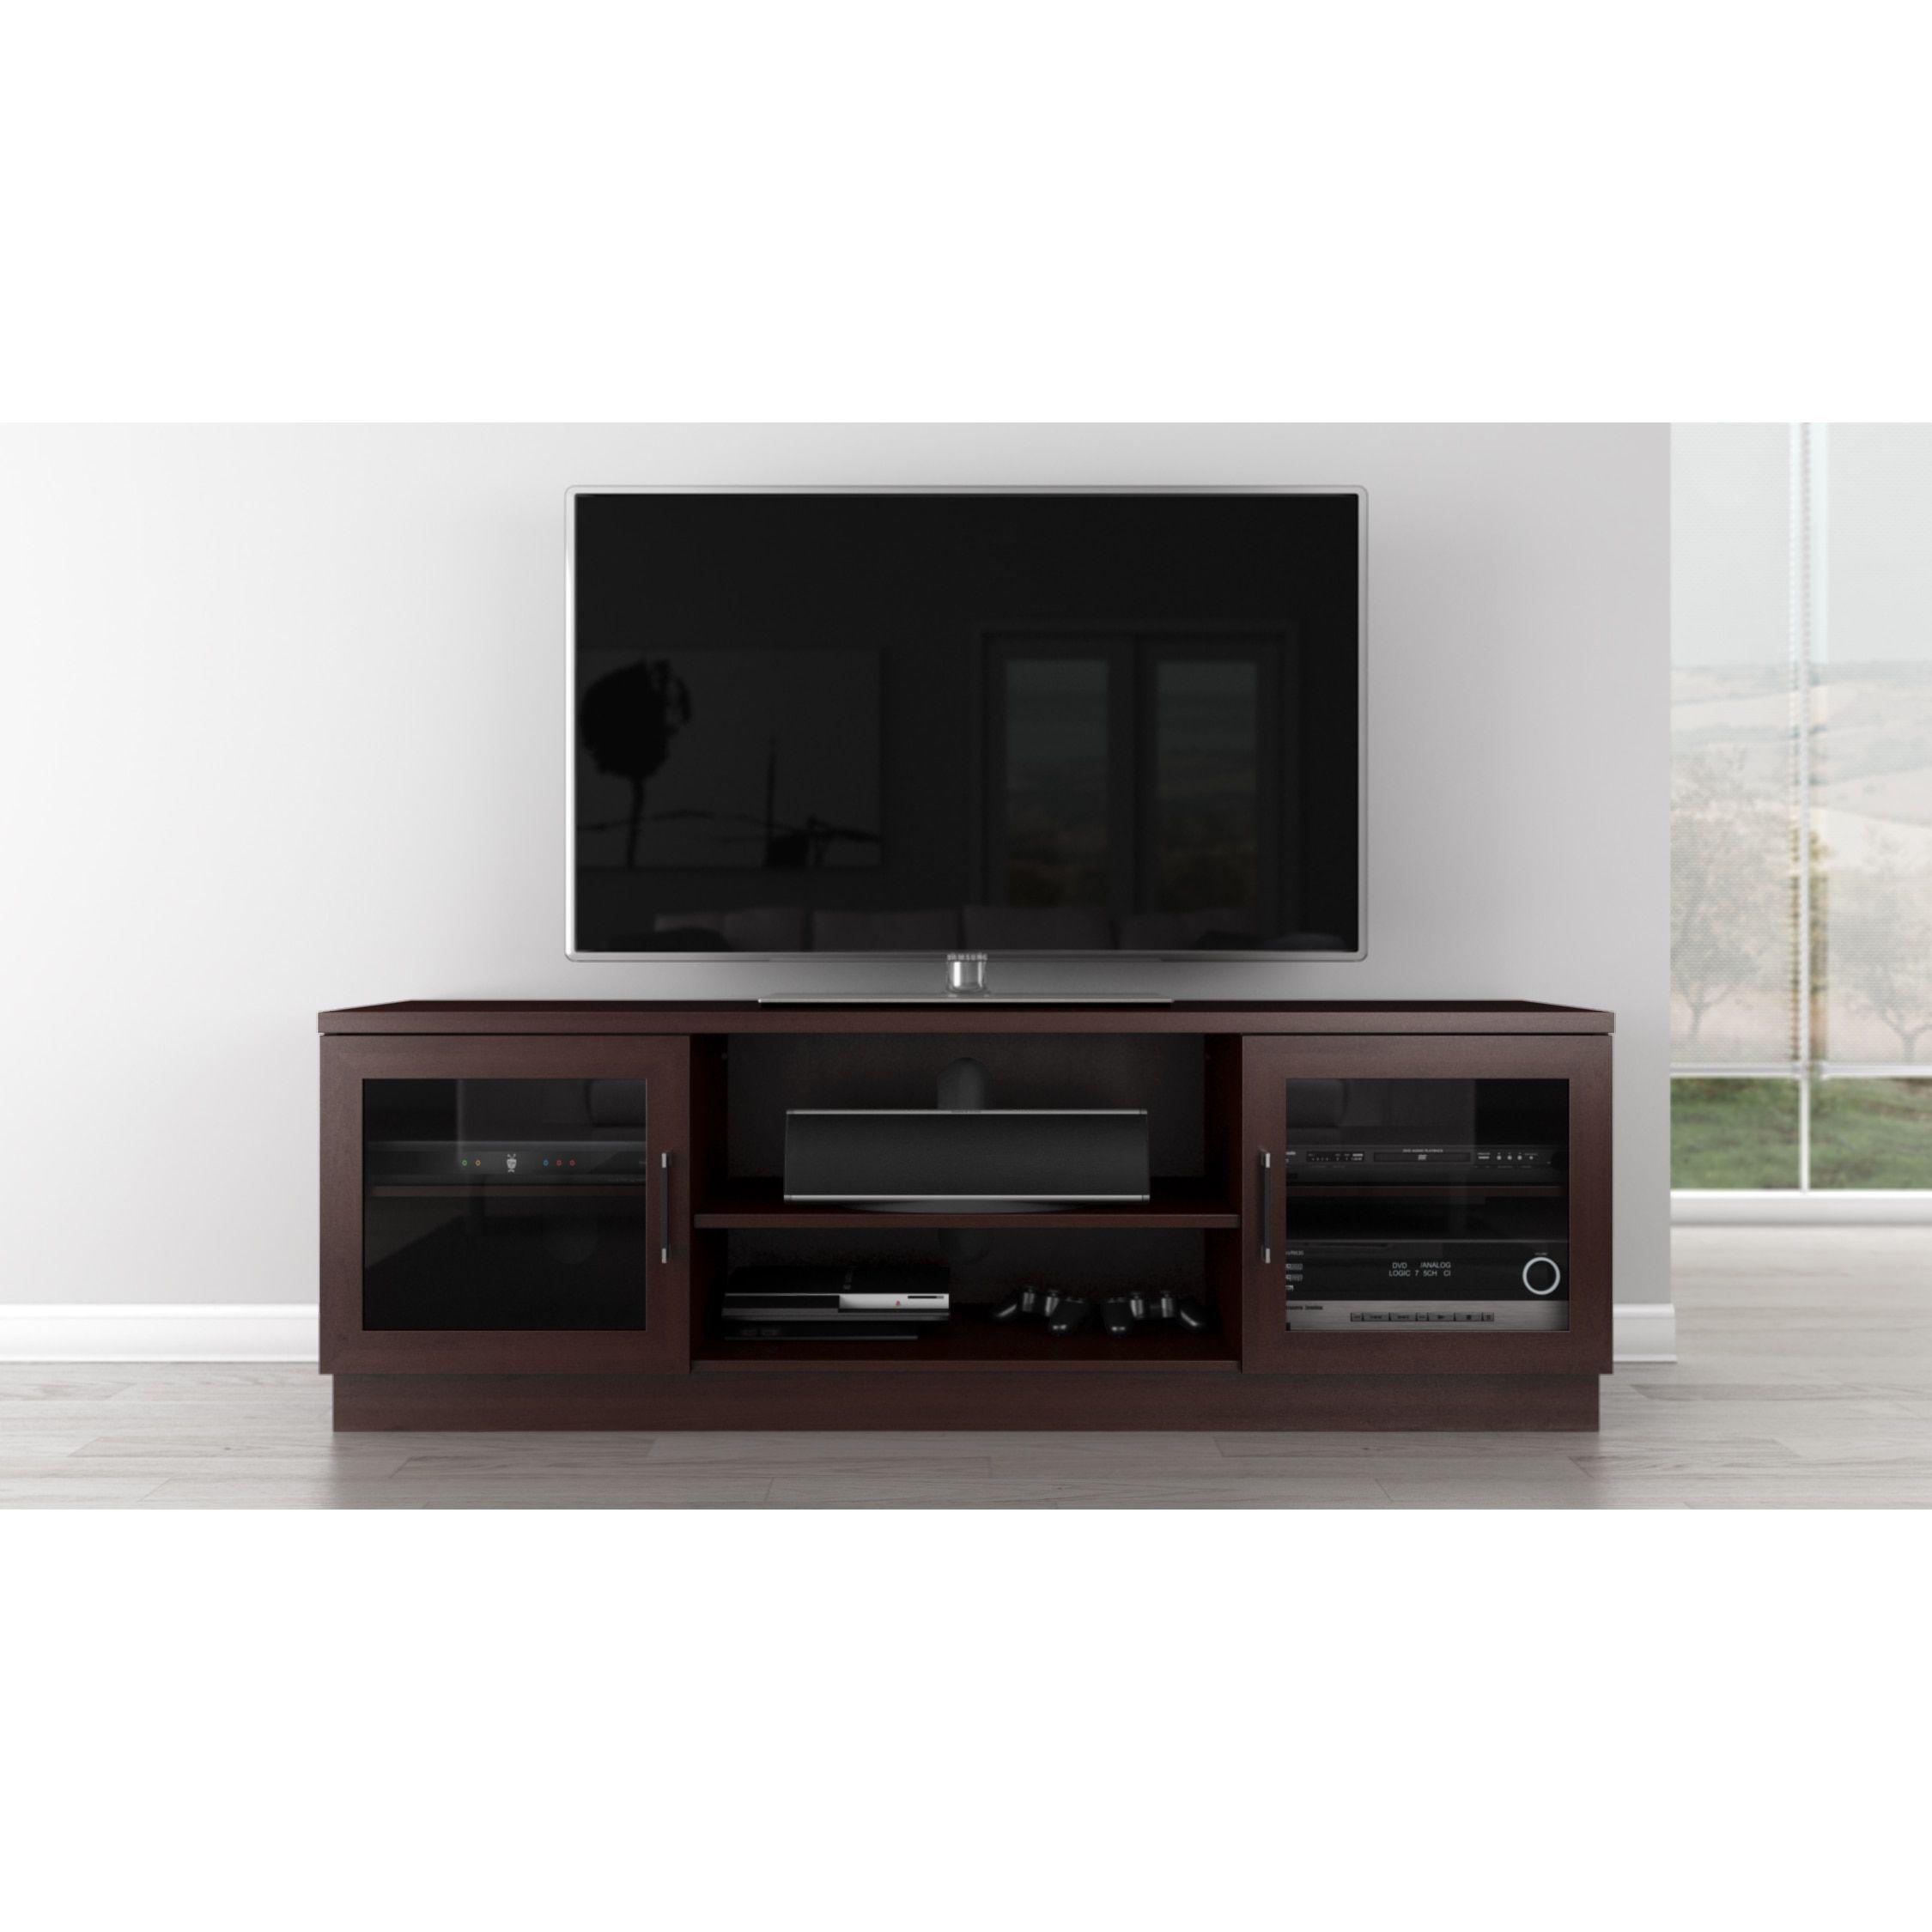 Furnitech Cappuccino Finish Cherry Wood Veneer Mdf 70 Inch 3 Shelf  # Meuble Tv Philips